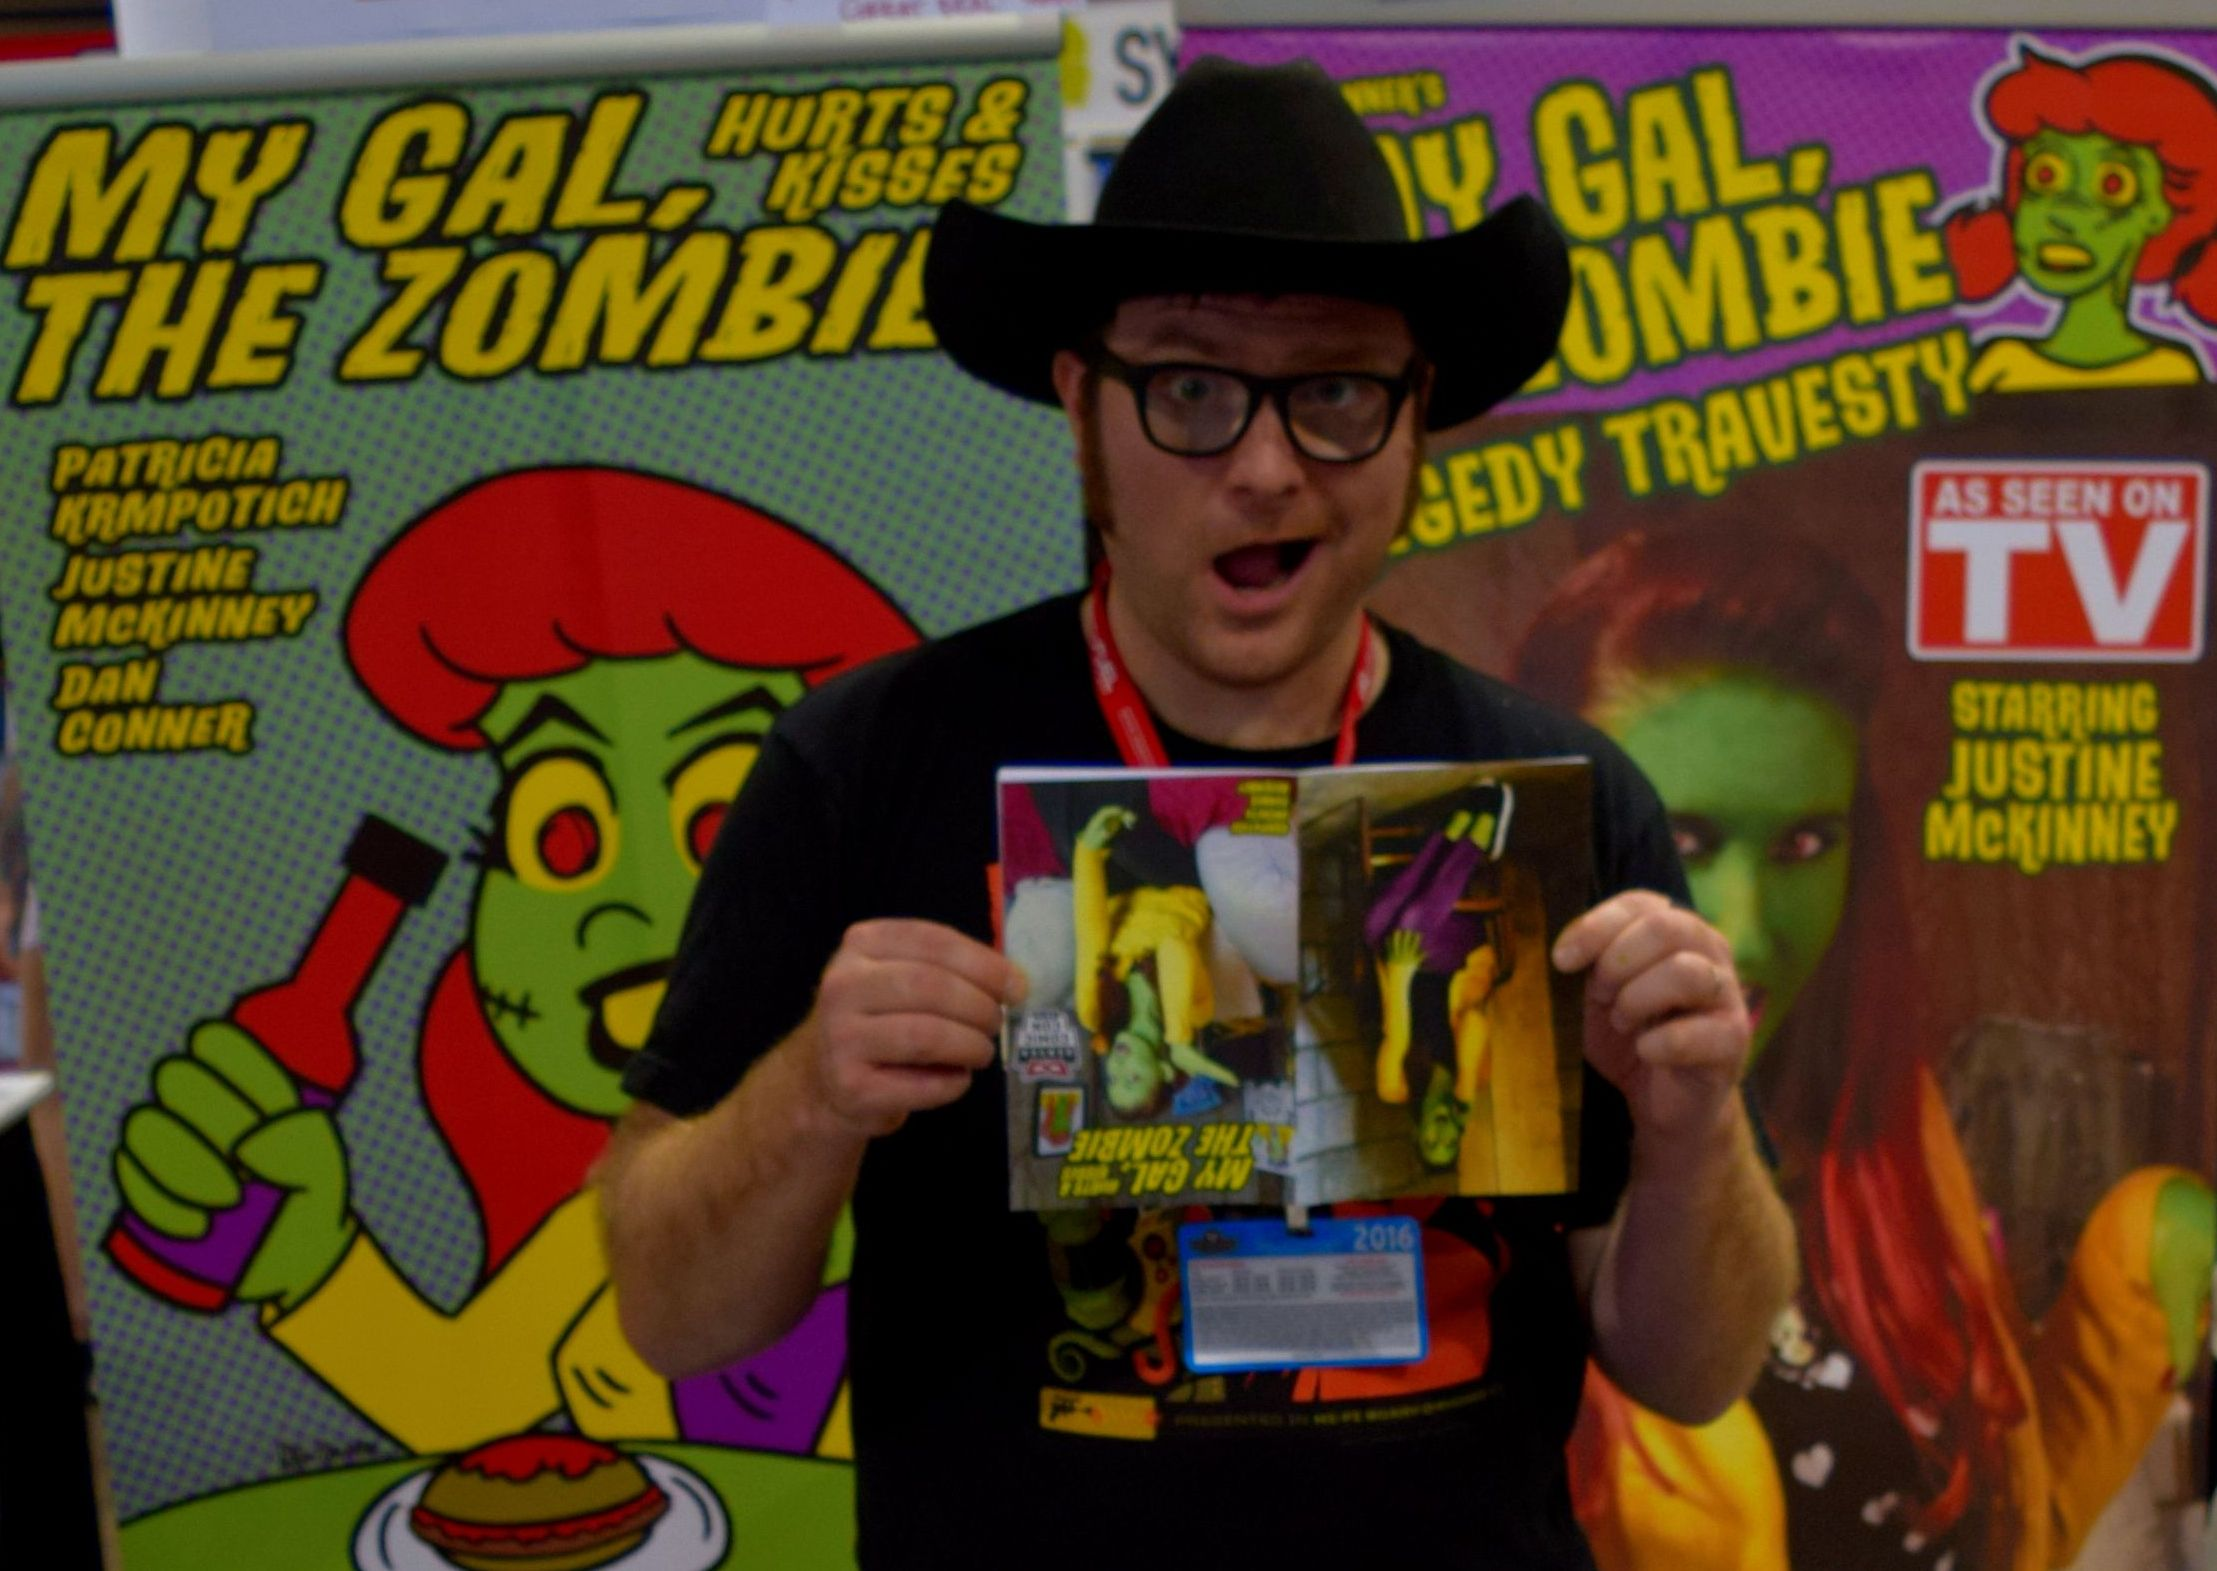 Dan Conner at Denver Comic Con 2016.